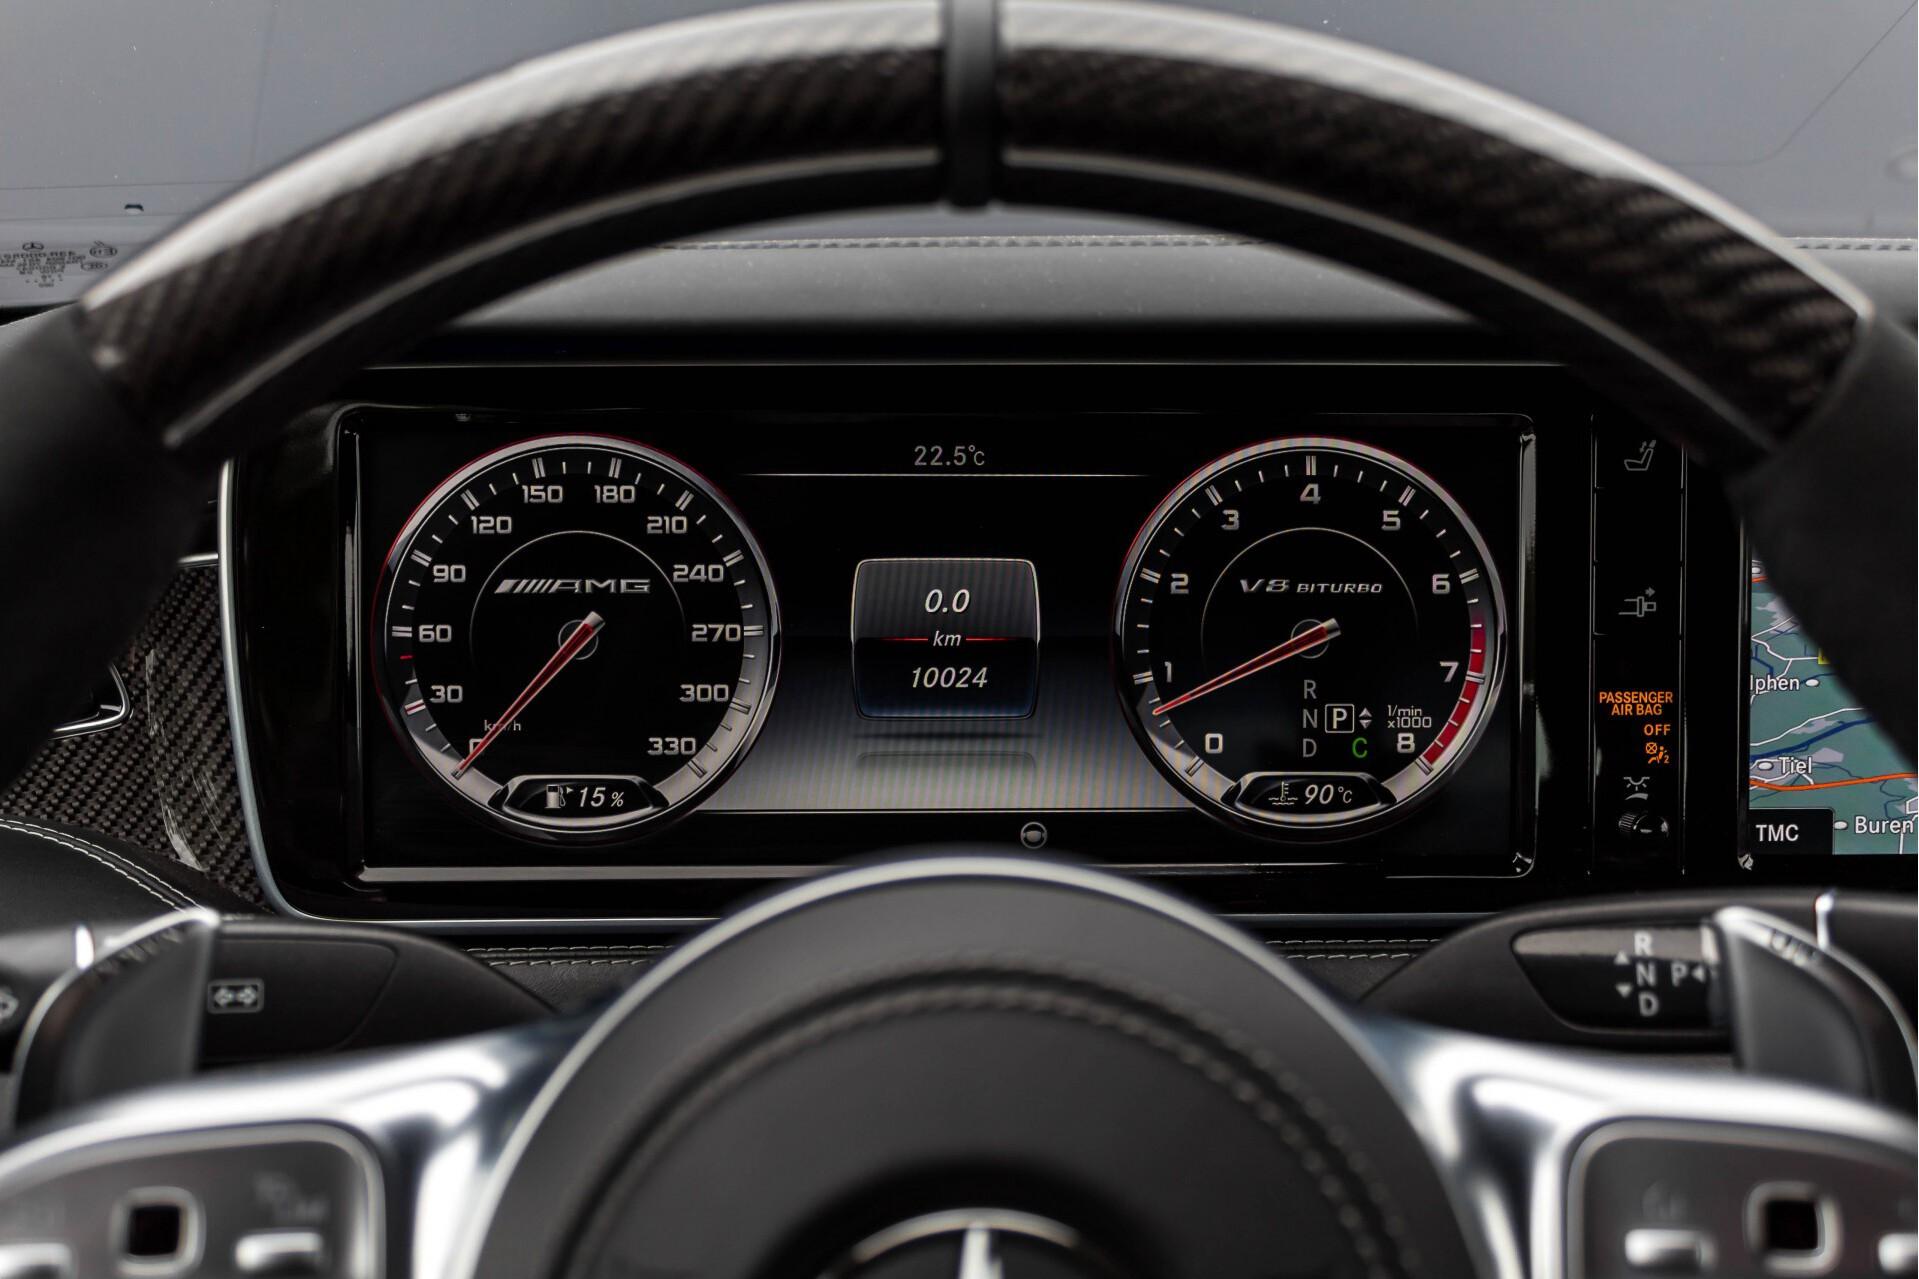 Mercedes-Benz S-Klasse Cabrio 63 AMG 4-M Ceramic/Designo/Carbon/Burmester High End Aut Foto 14